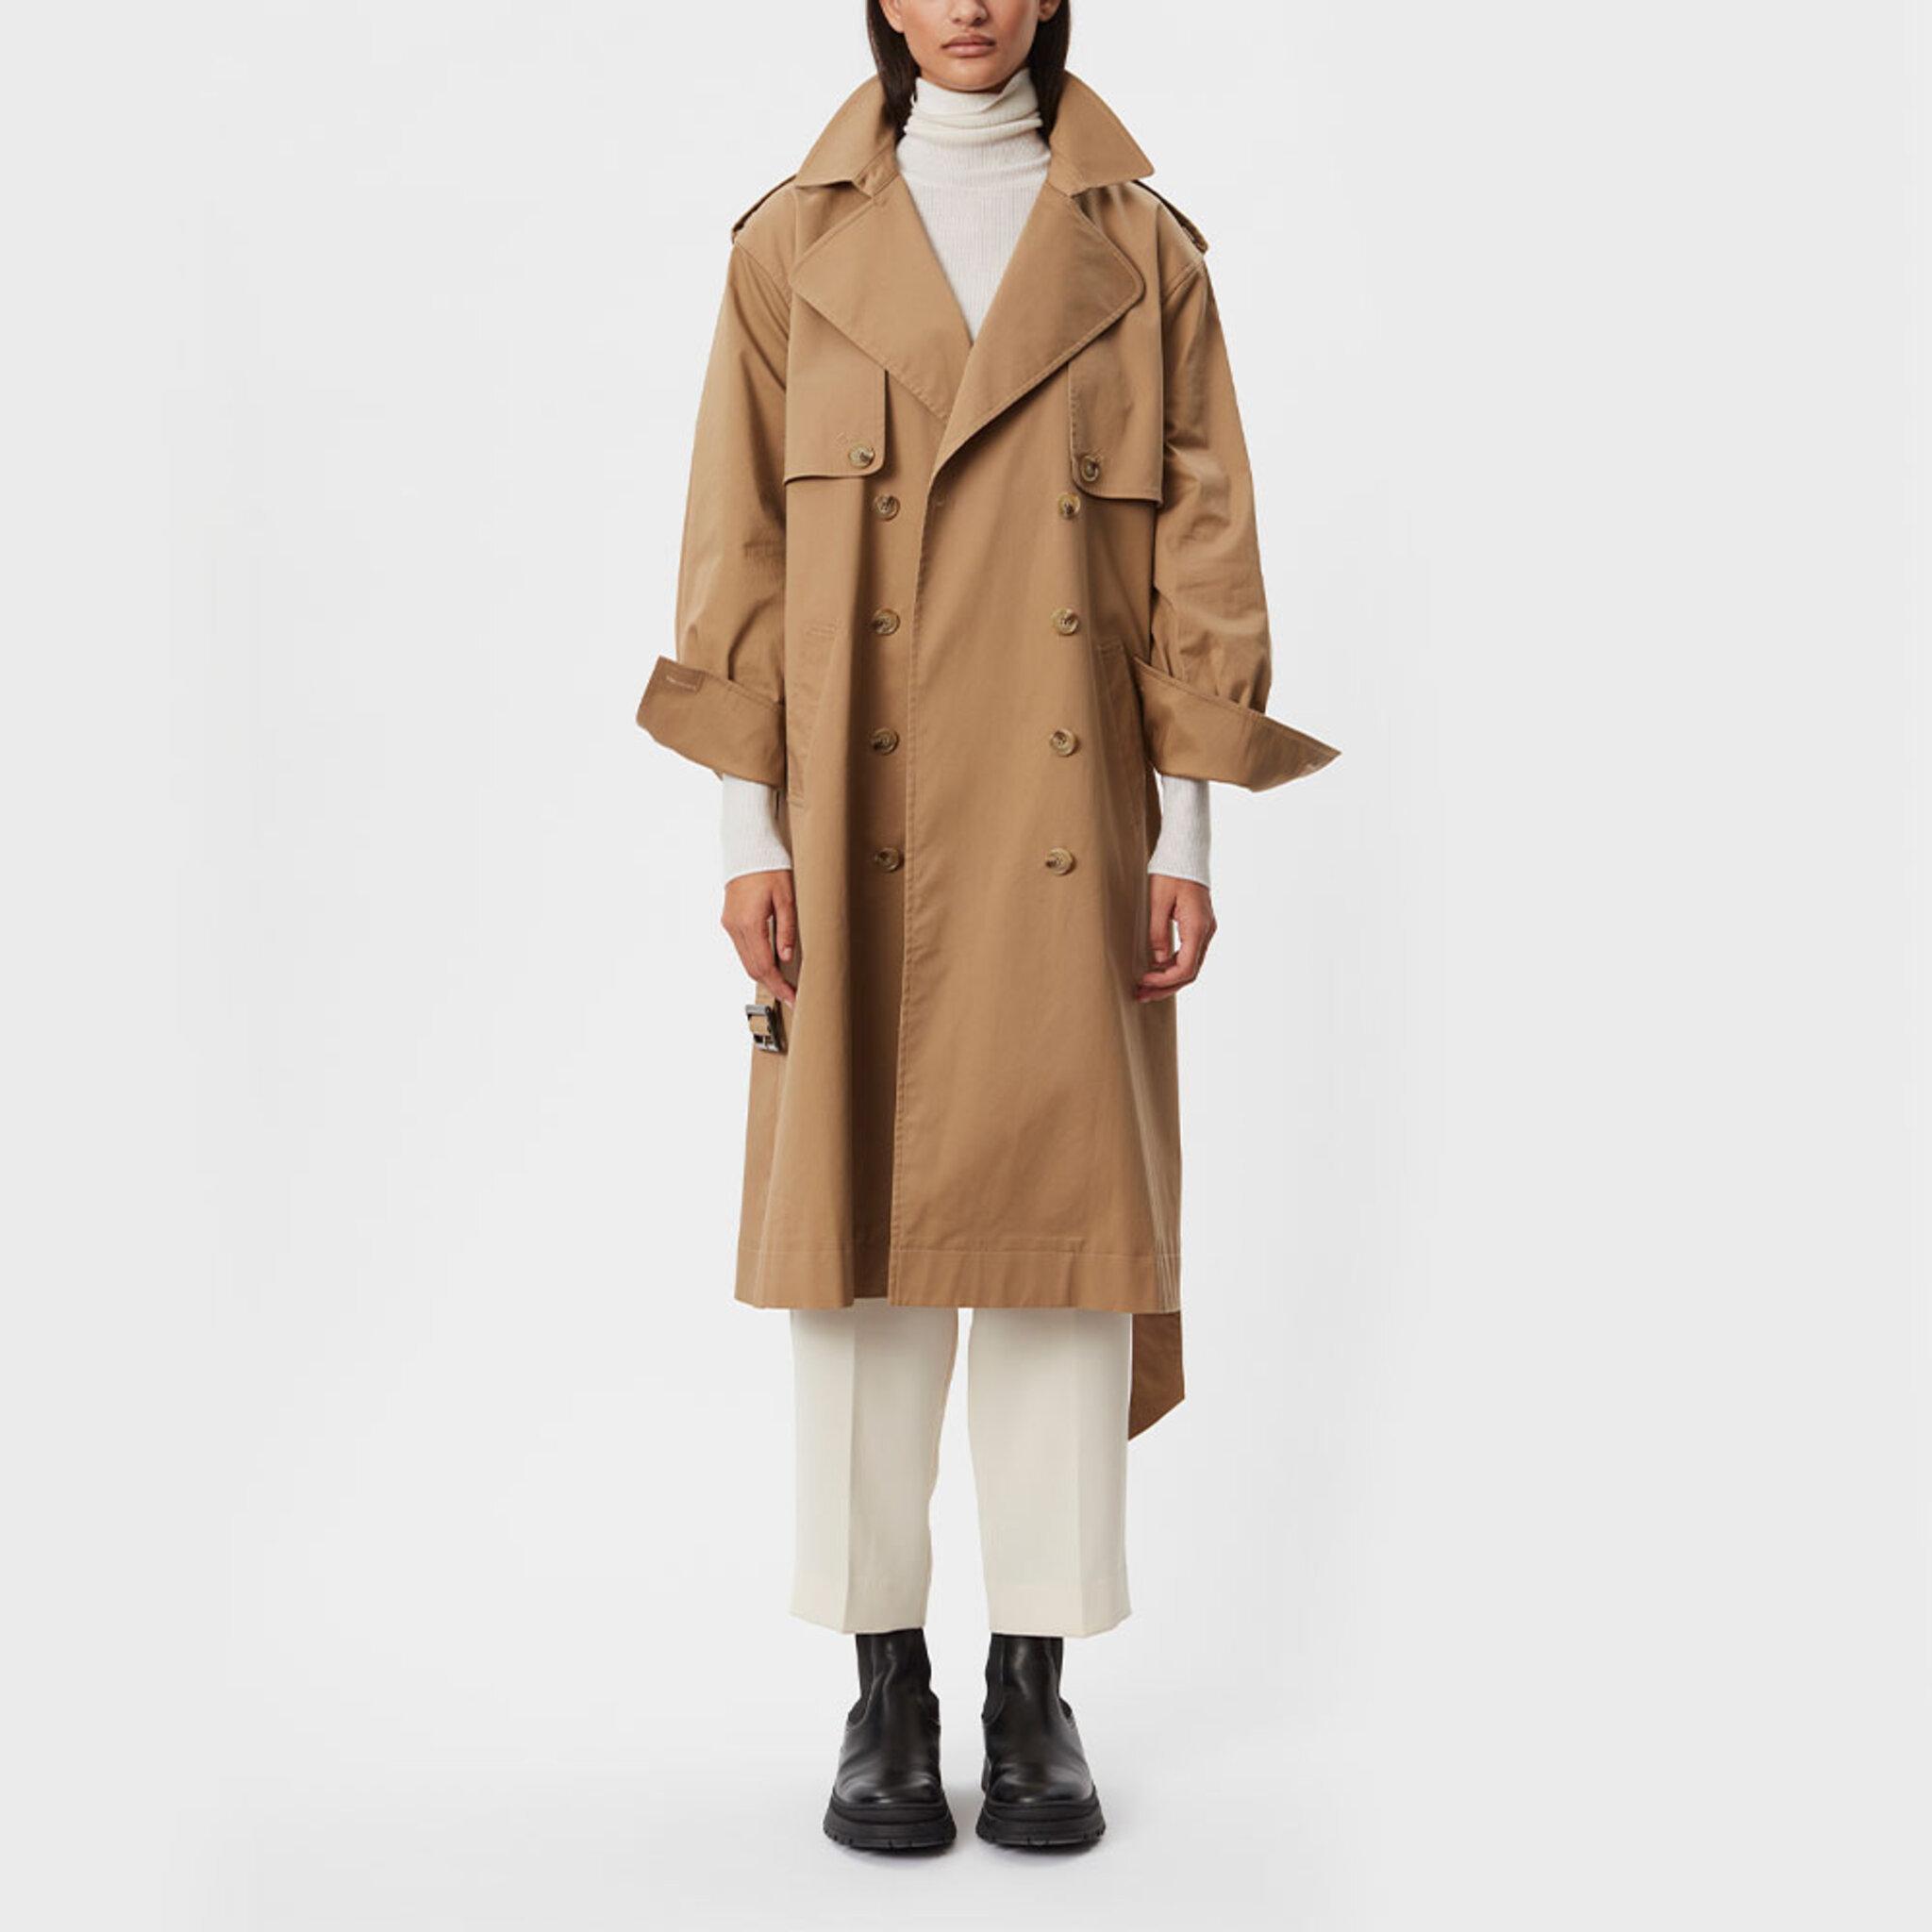 Bon Voyage Coats